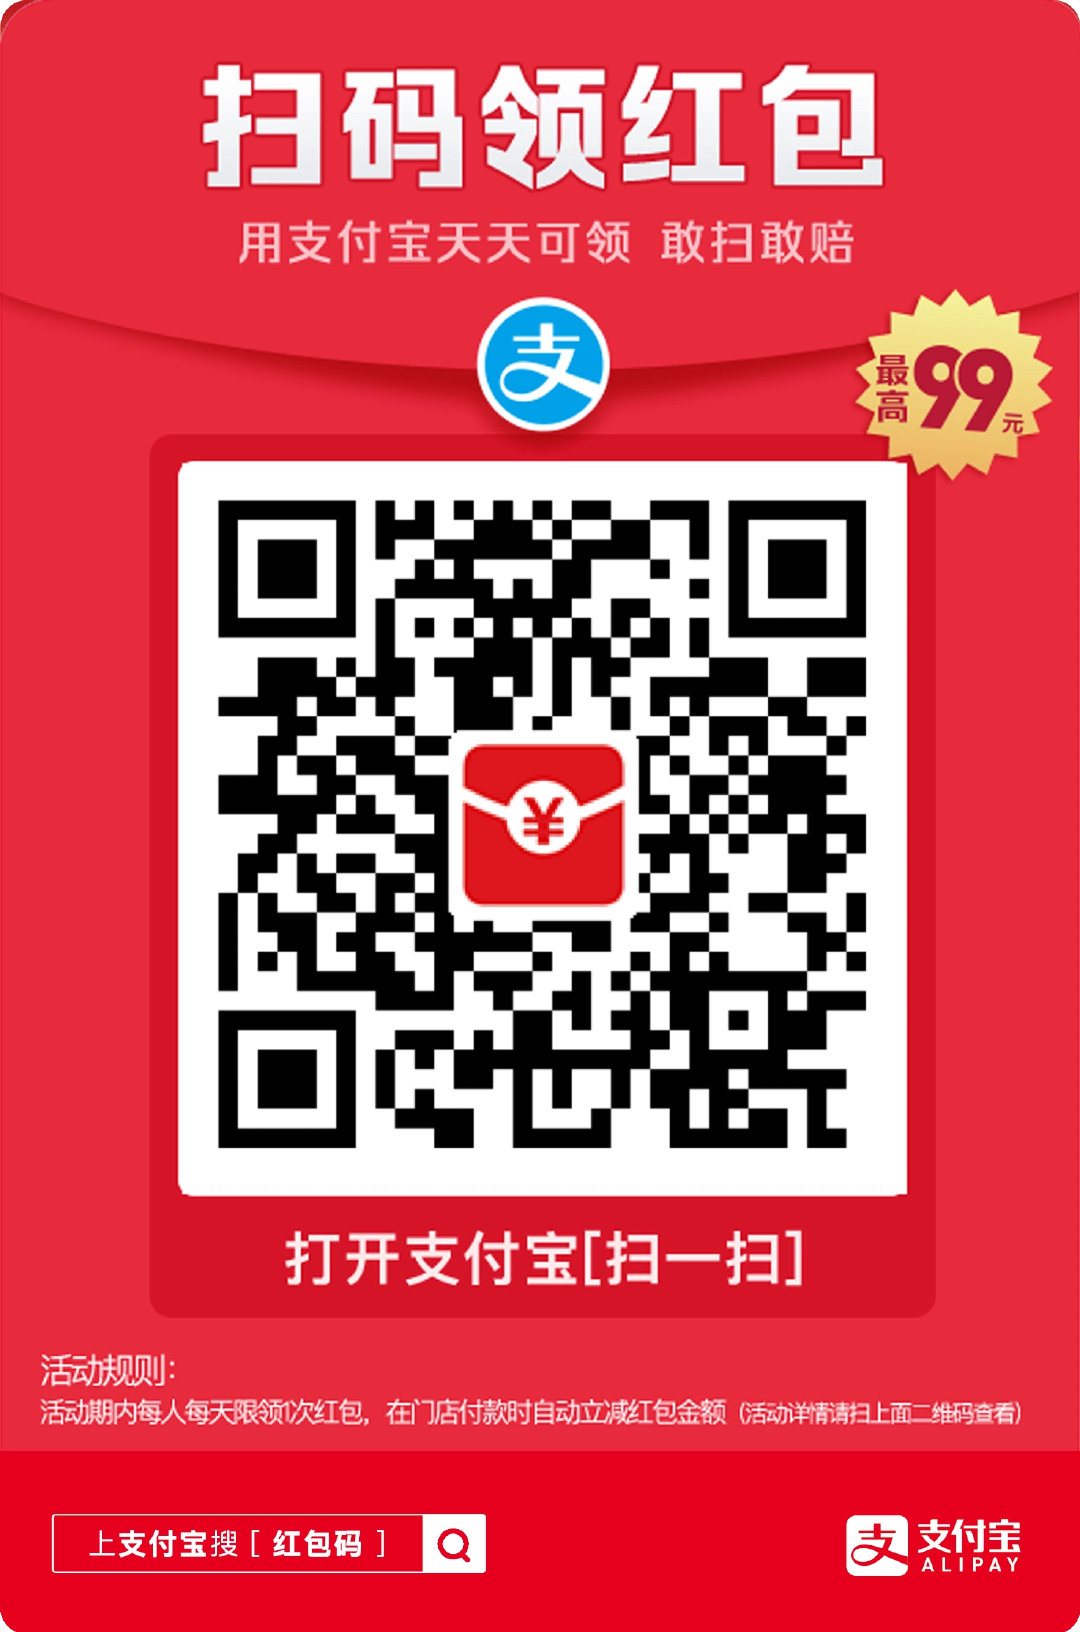 118kj开奖现场手机版香港_118kj开奖现场手机版